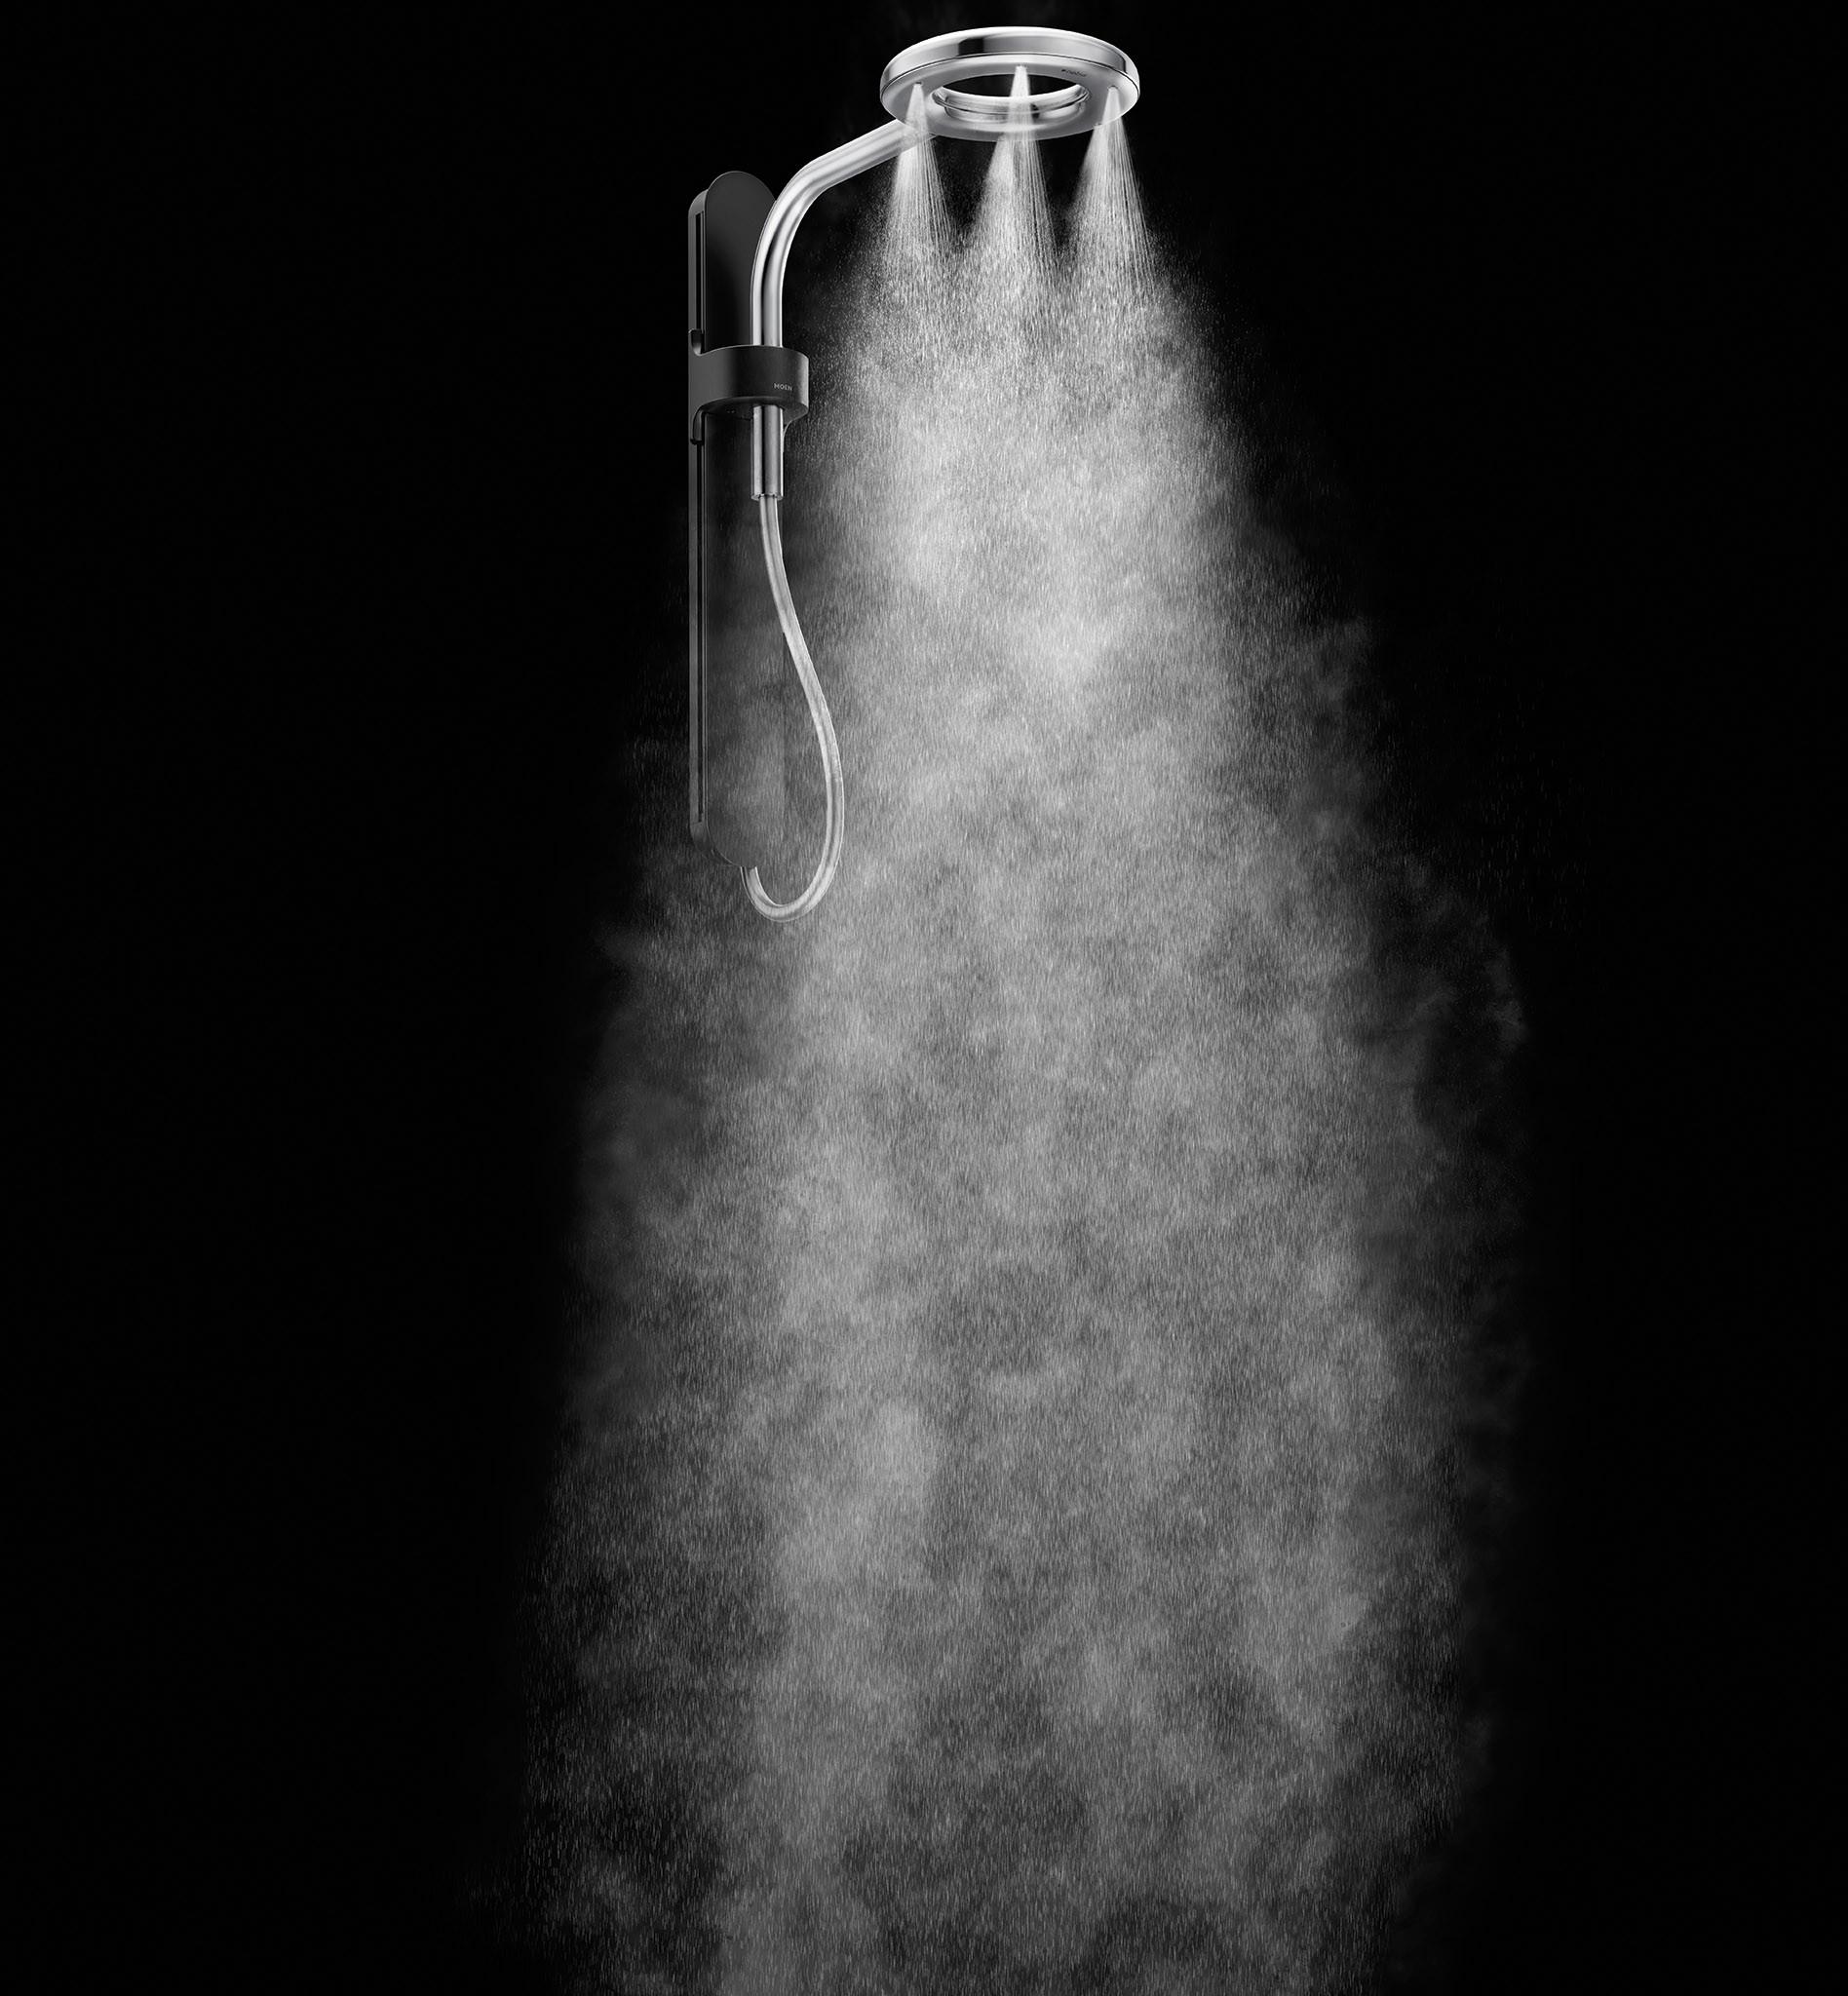 Nebia by Moen Atomized Water